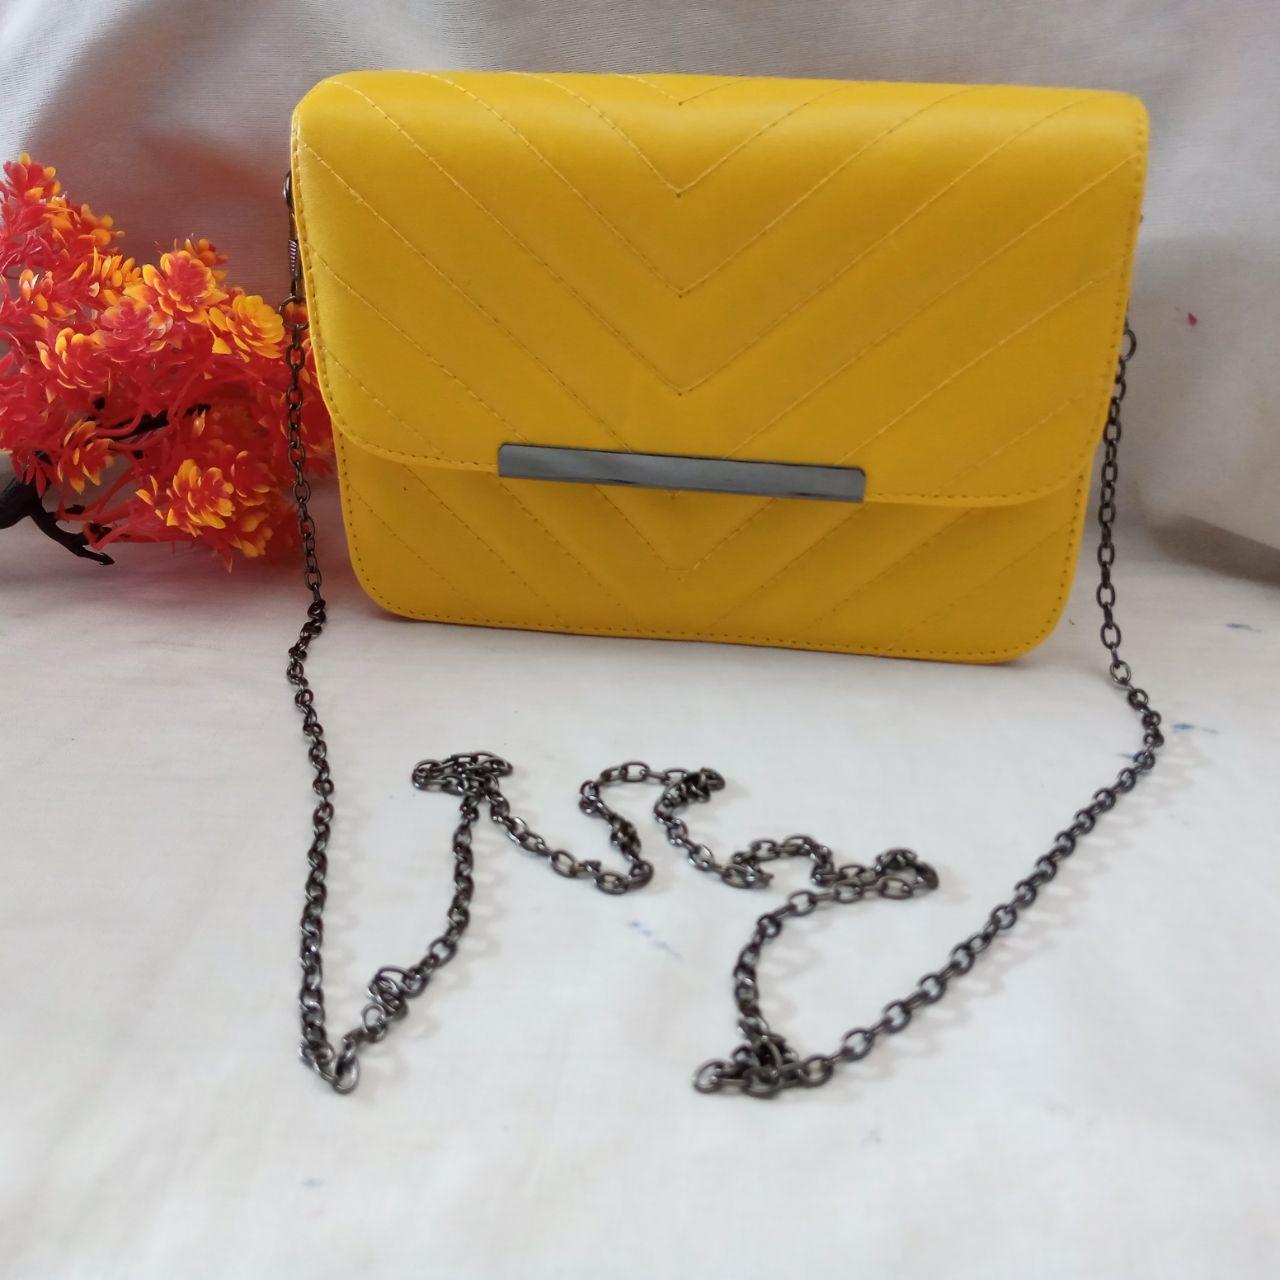 ini adalah Tas Miro Mustard, size: Diameter 17 cm, material: Sintetis, color: yellow, brand: tasbahuindonesia, age_group: all ages, gender: unisex